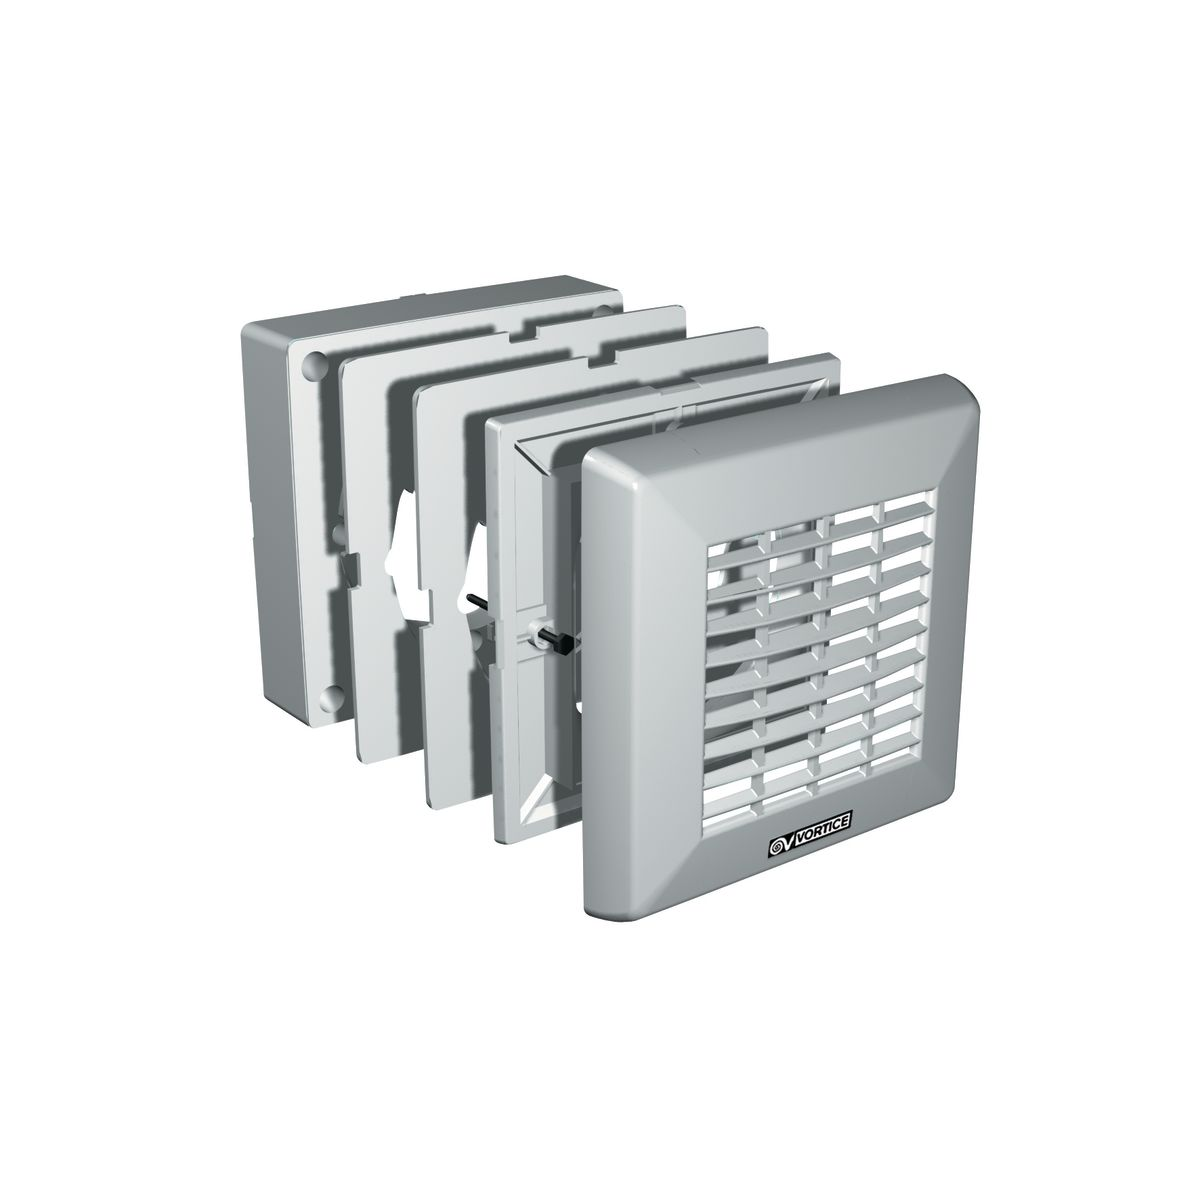 Kit finestra Vortice Ø 123 mm: prezzi e offerte online